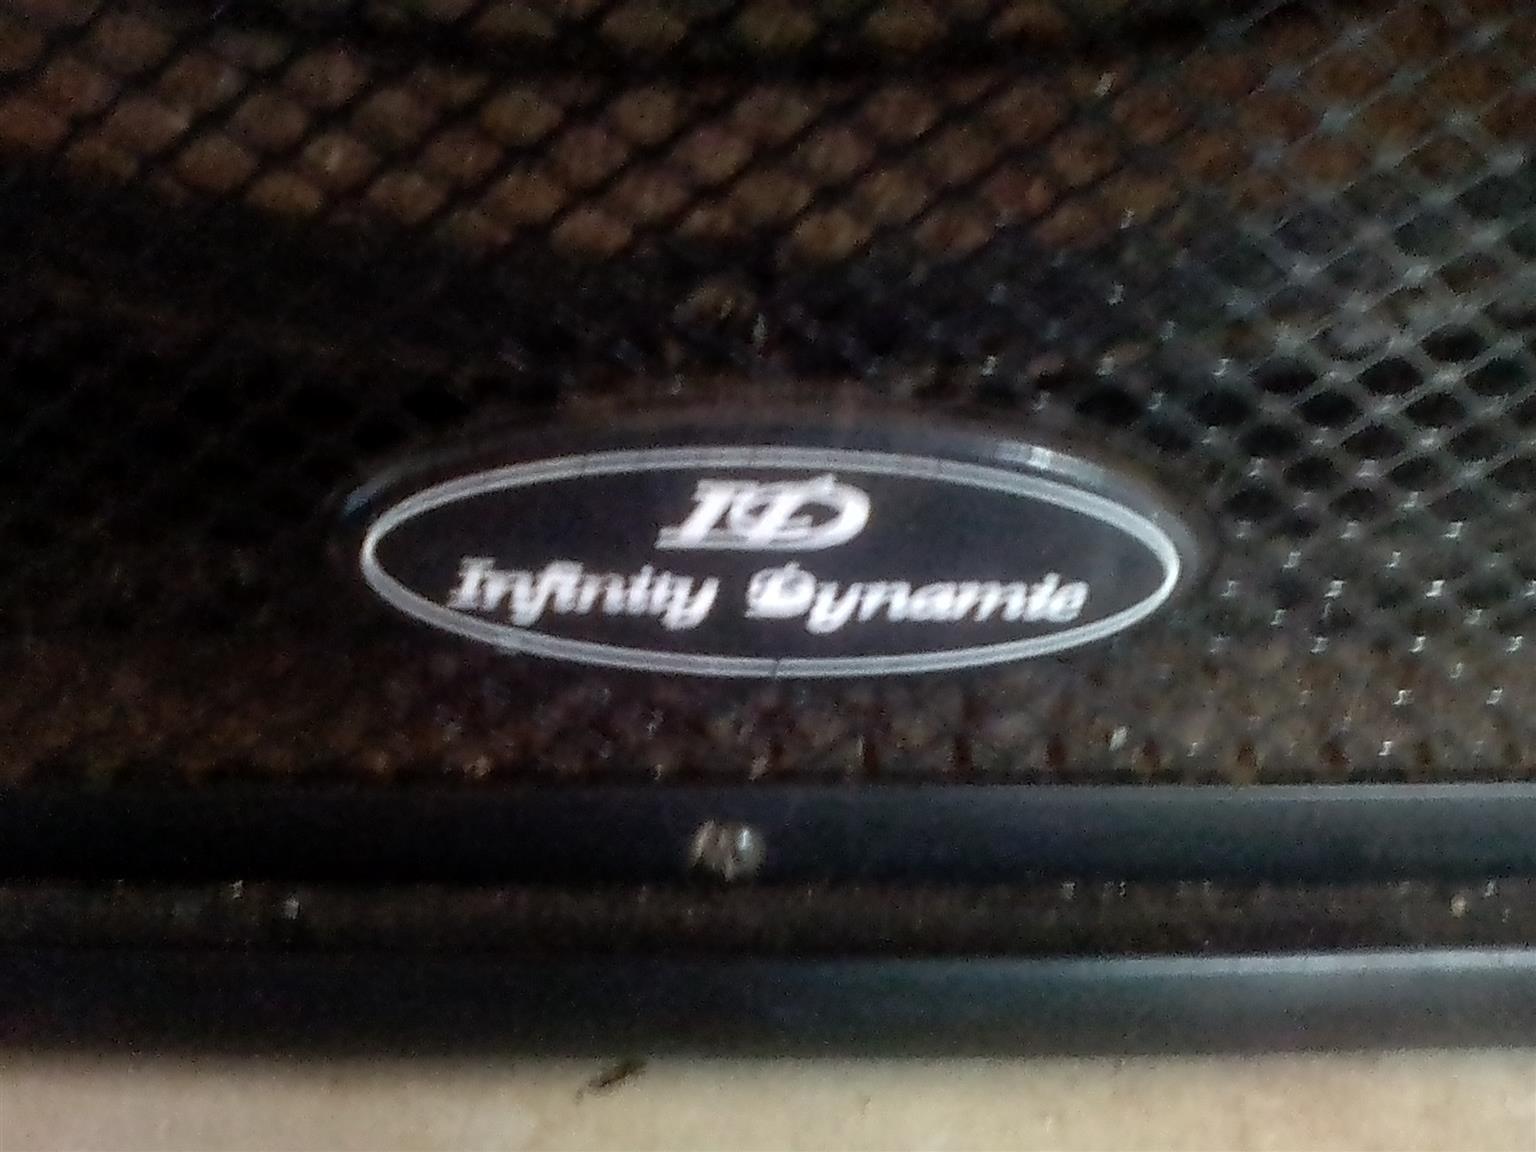 Infinity dynamics 15 speakers